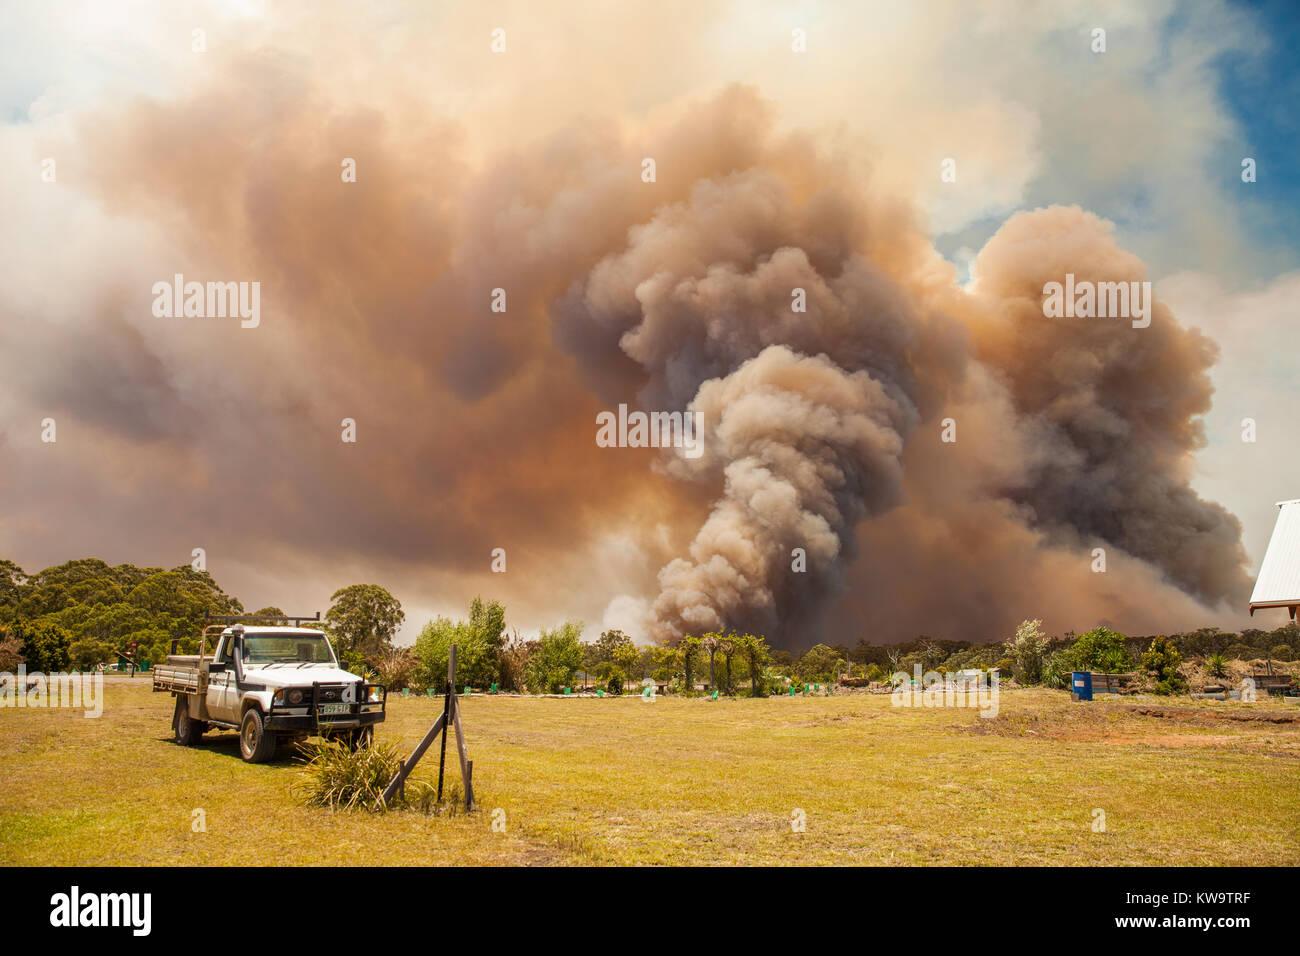 Bushfire on rural property in New South Wales, Australia